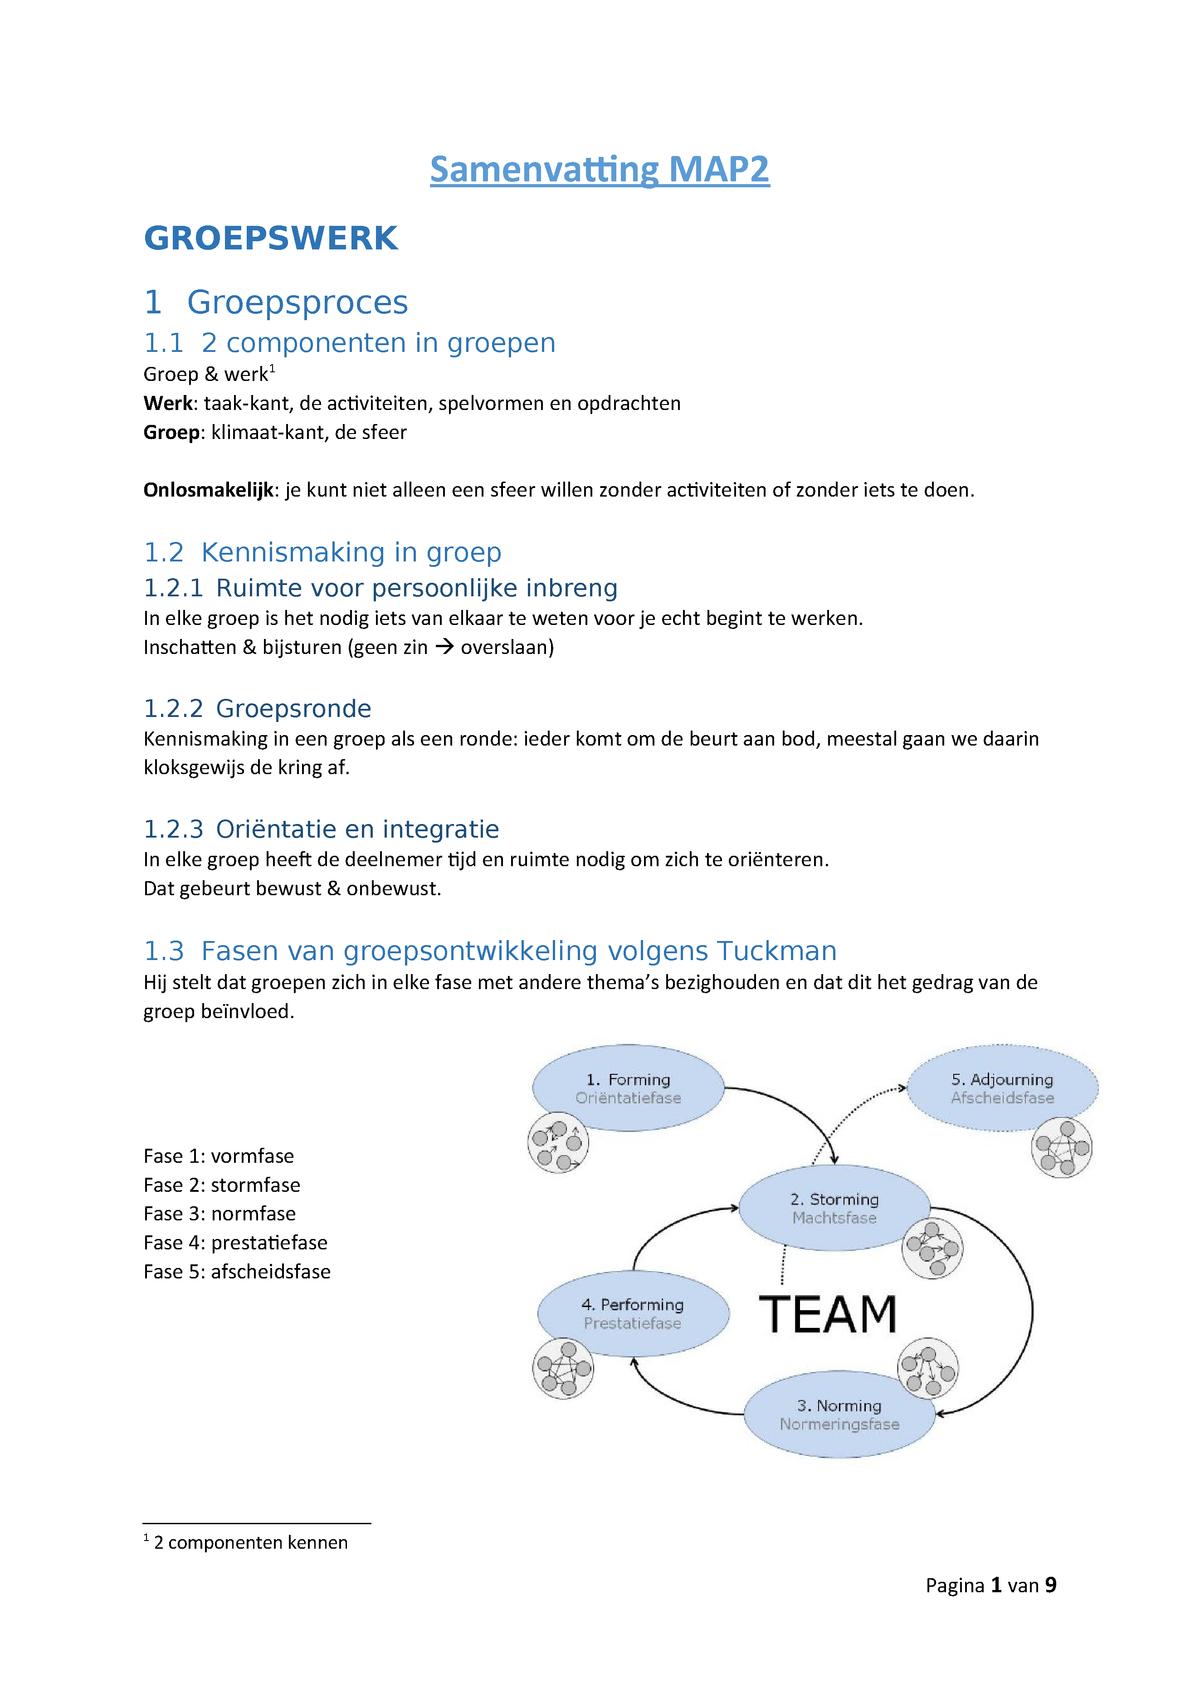 925d042f818 Samenvatting - Groepswerk - SW MAP2 - StuDocu